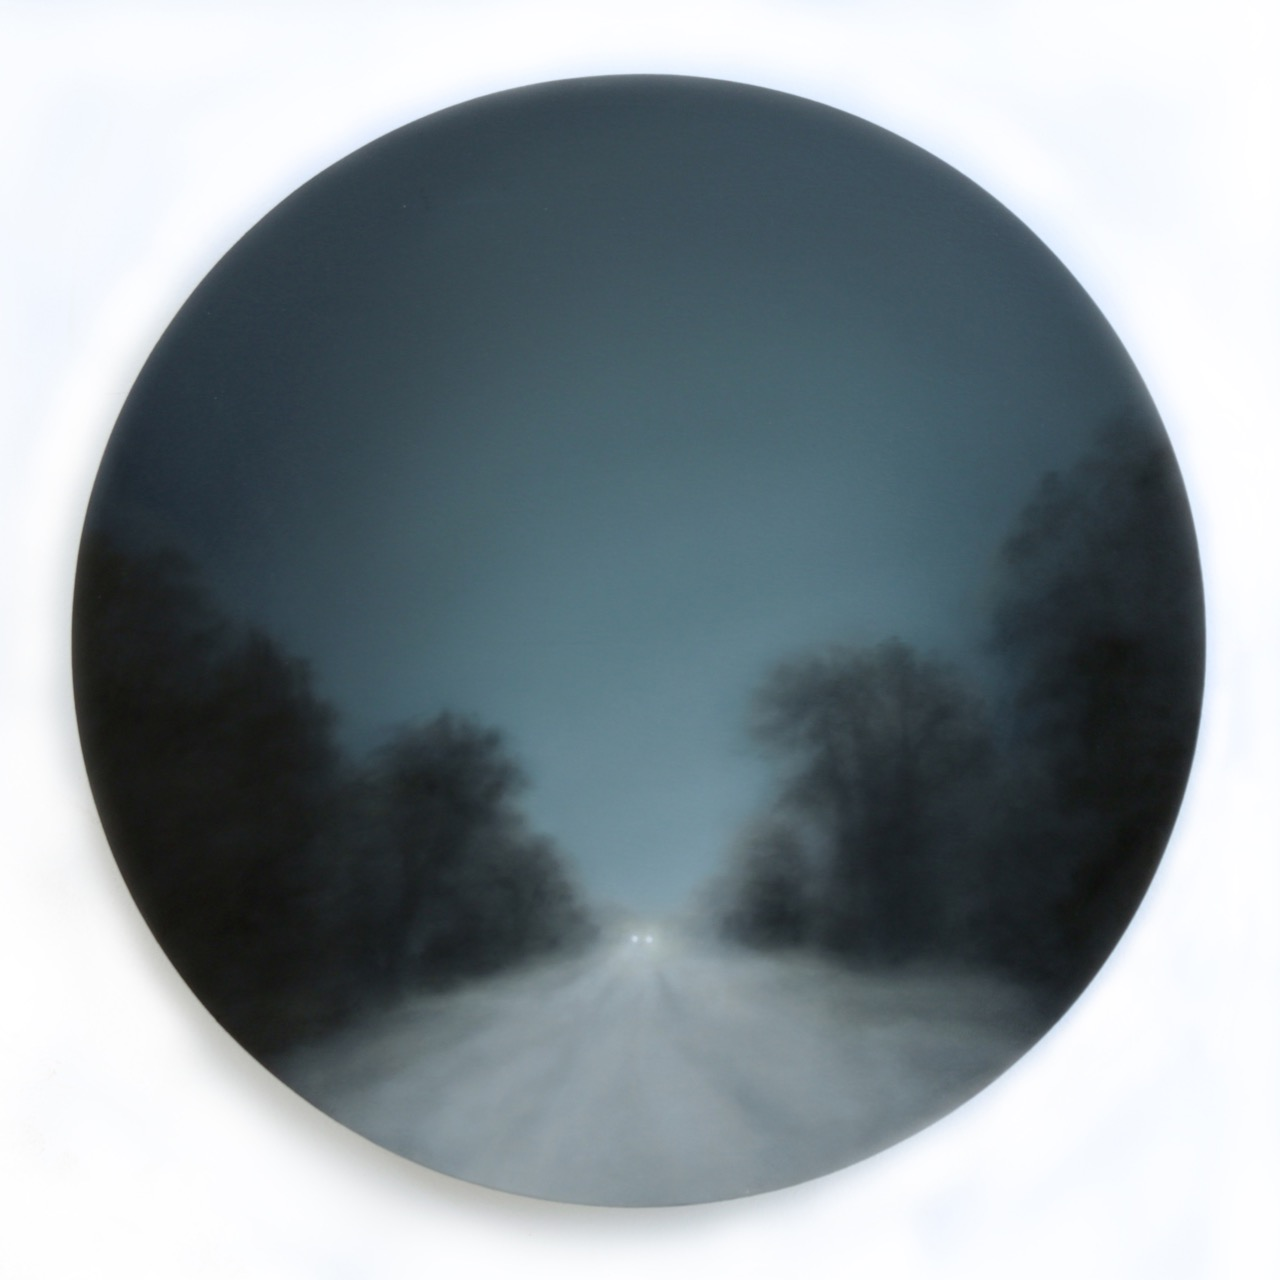 Figment XXVII, oil on birch ply, 30cm diameter, 2019